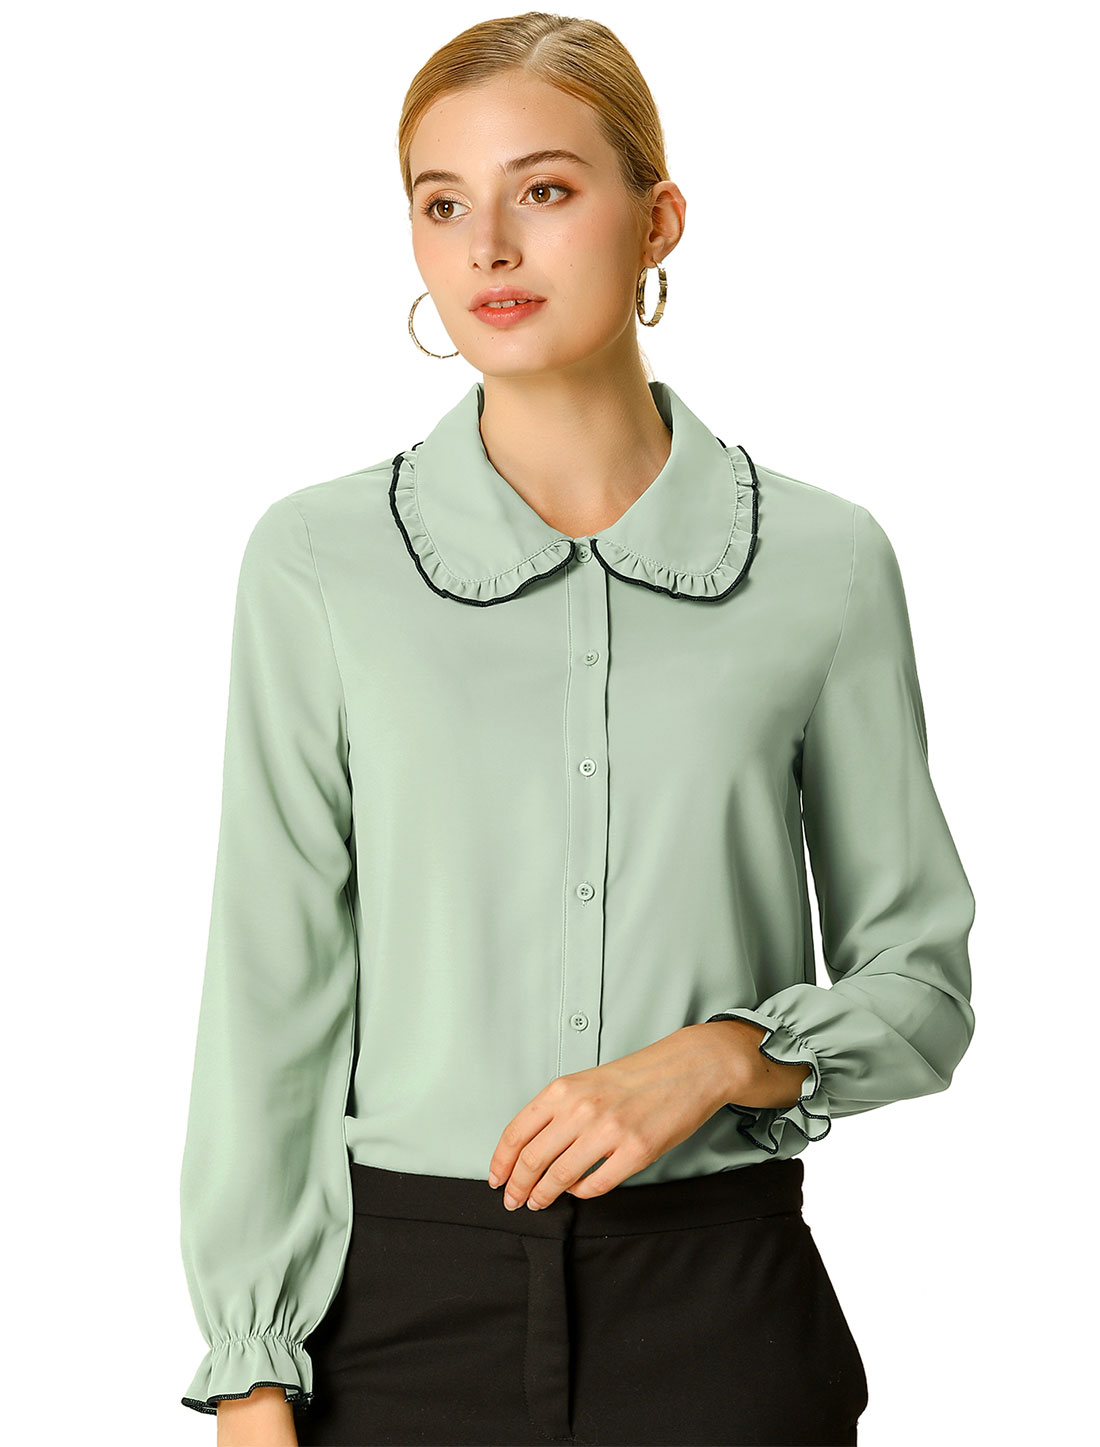 Women's Sweet Ruffle Peter Pan Collar Long Sleeves Button Up Shirt Green XS